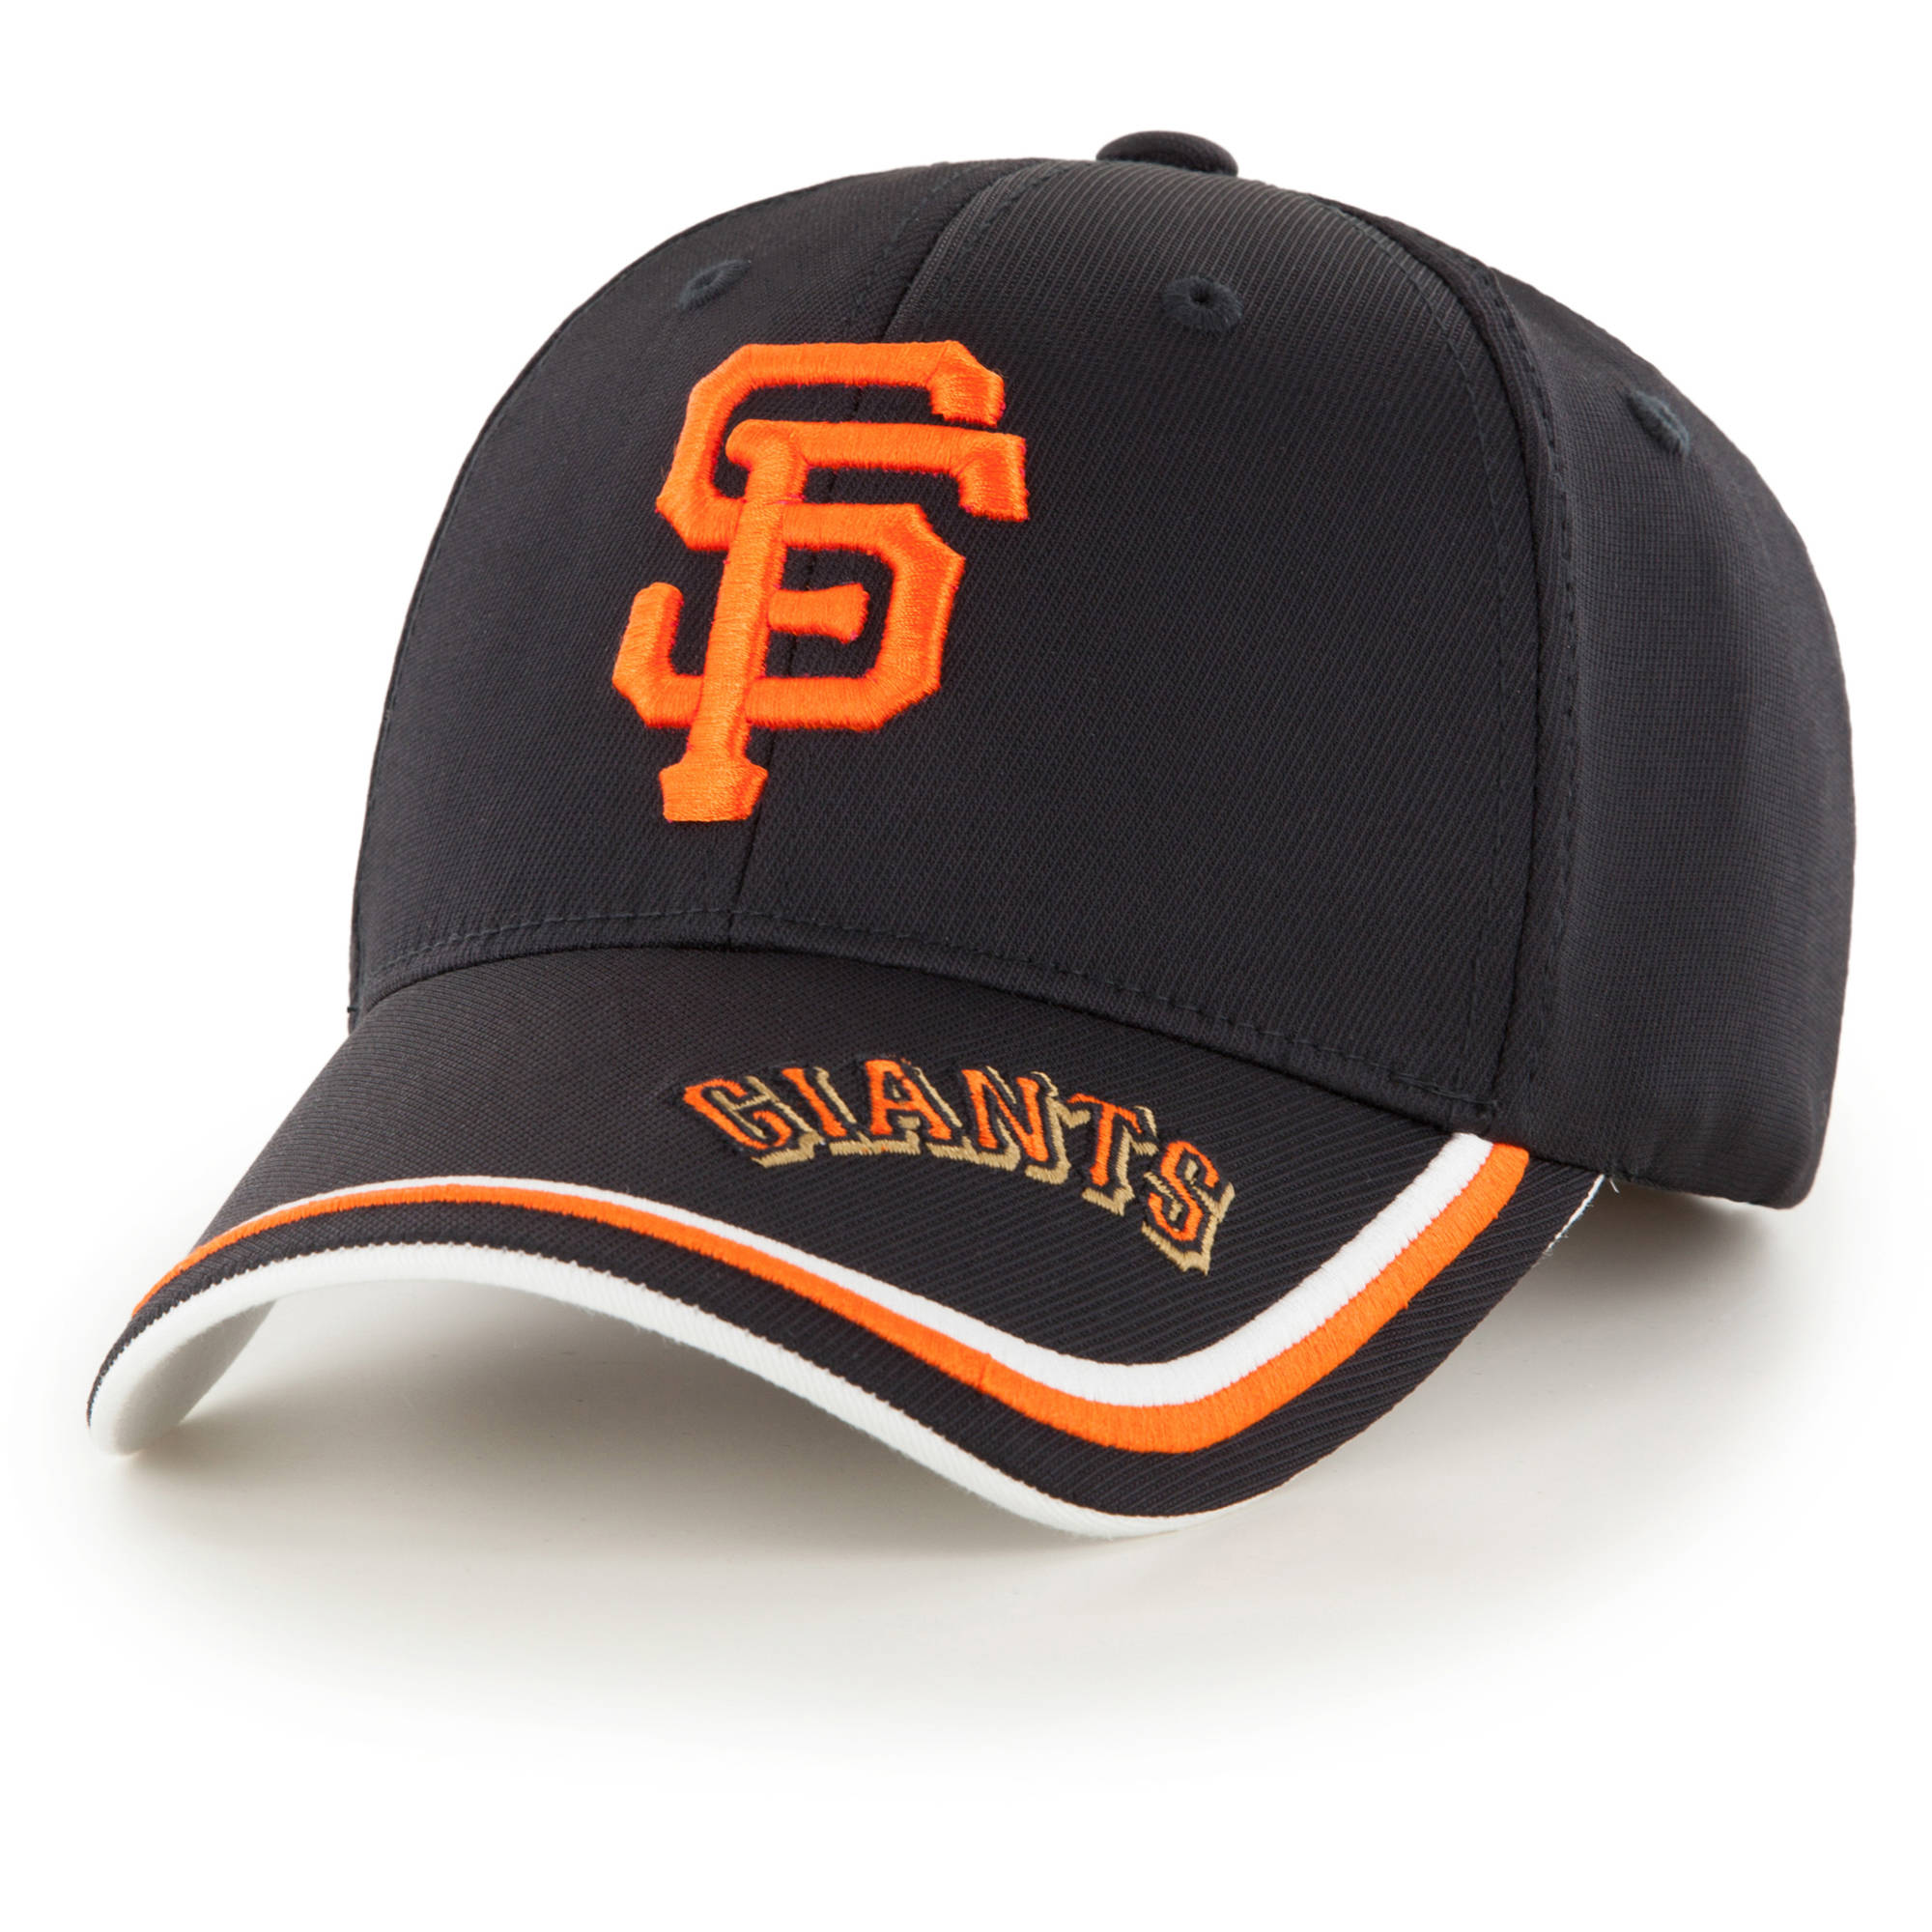 best website 699e0 bcd72 Fan Favorite - MLB Forest Cap, San Francisco Giants - Walmart.com